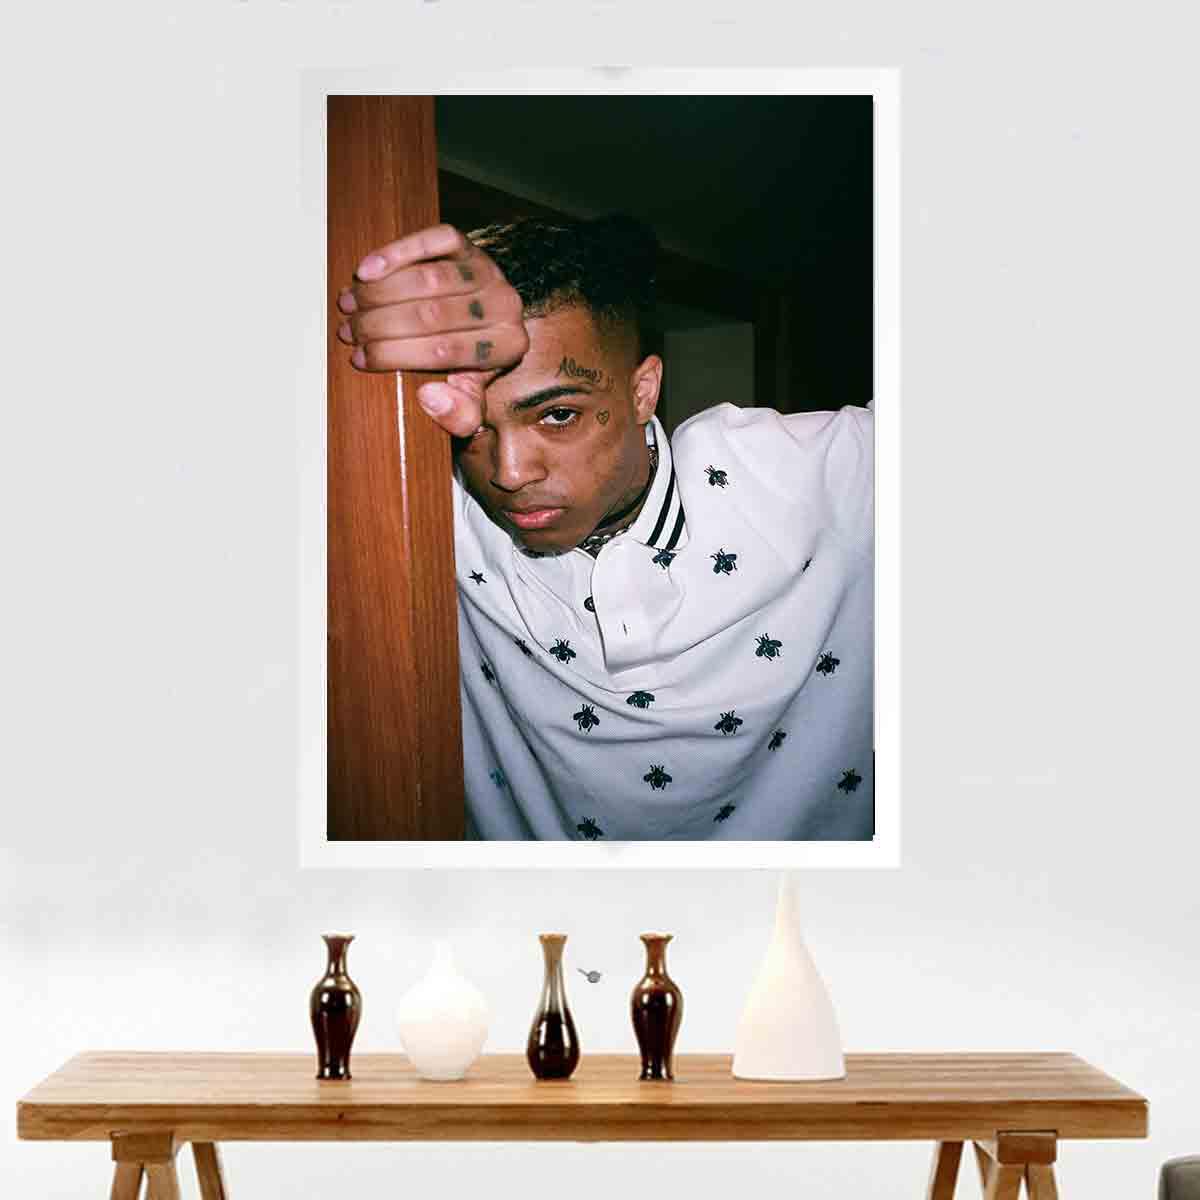 New Art Poster Decoration Picture Print Music Singer XXXTentacion Rapper Hip Hop Wall Decor Canvas Painting27x40 12x18 24x36in